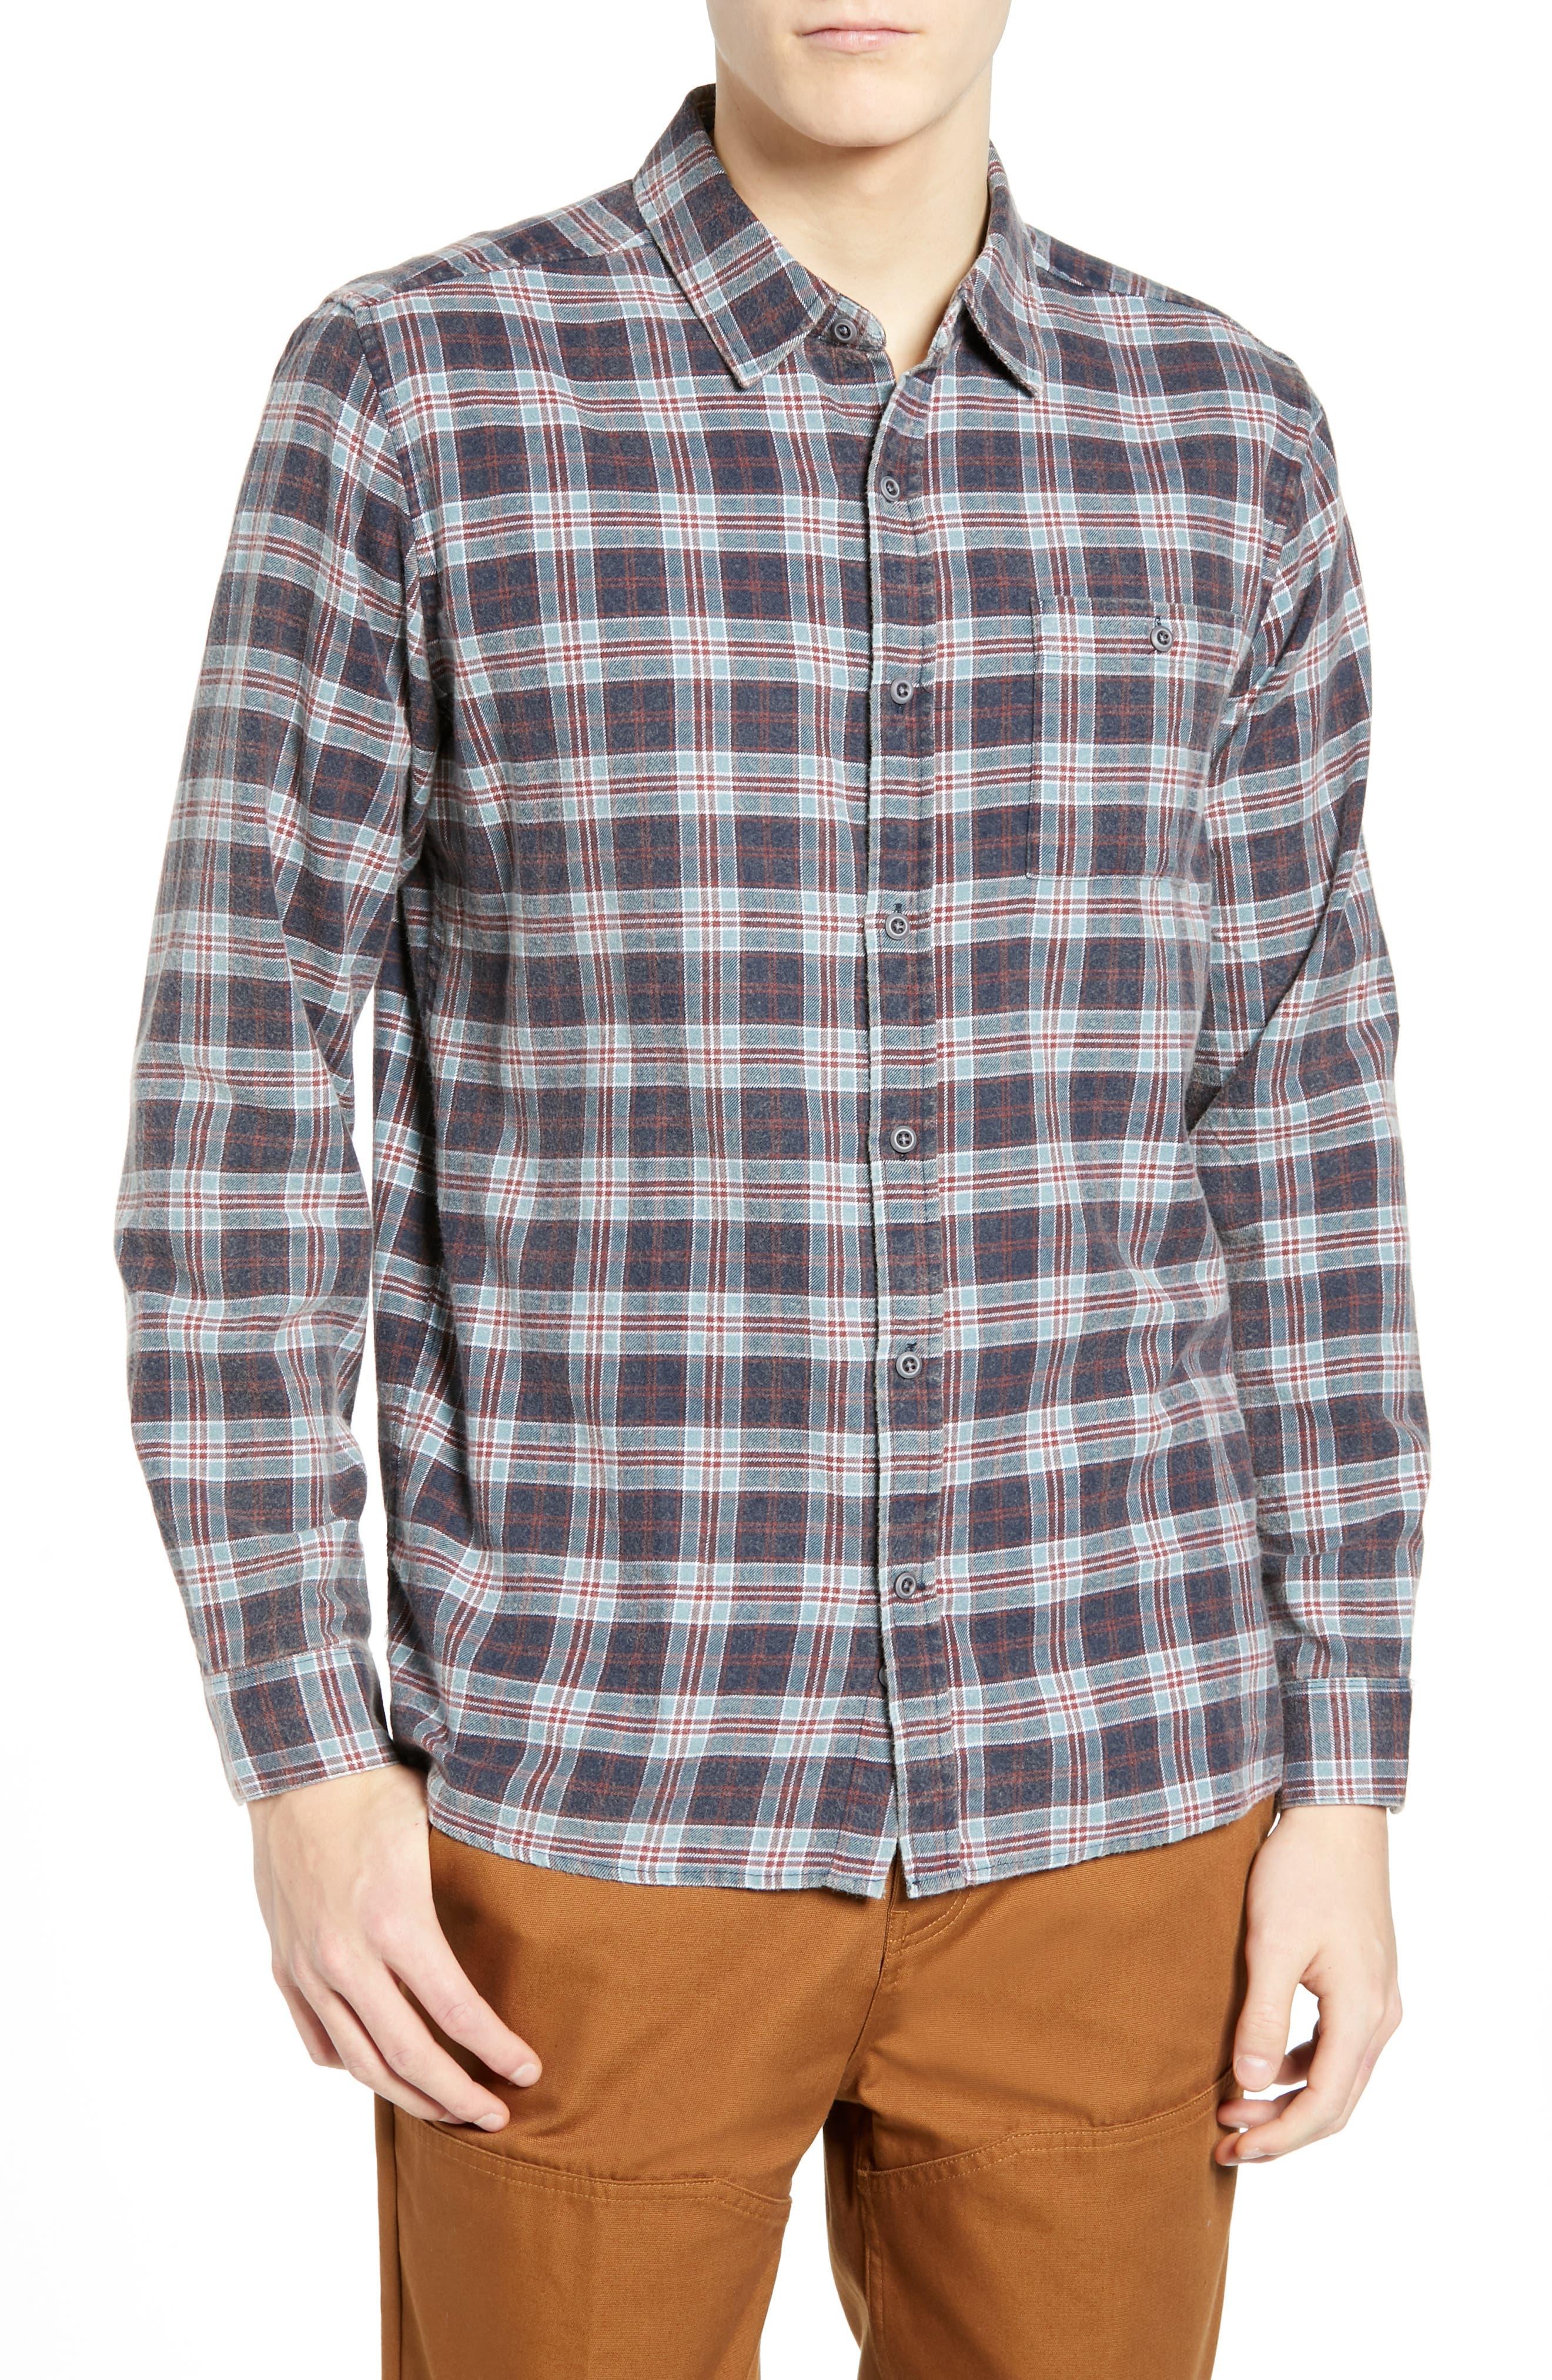 Hurley Ranger Plaid Cotton Flannel Sport Shirt, Blue